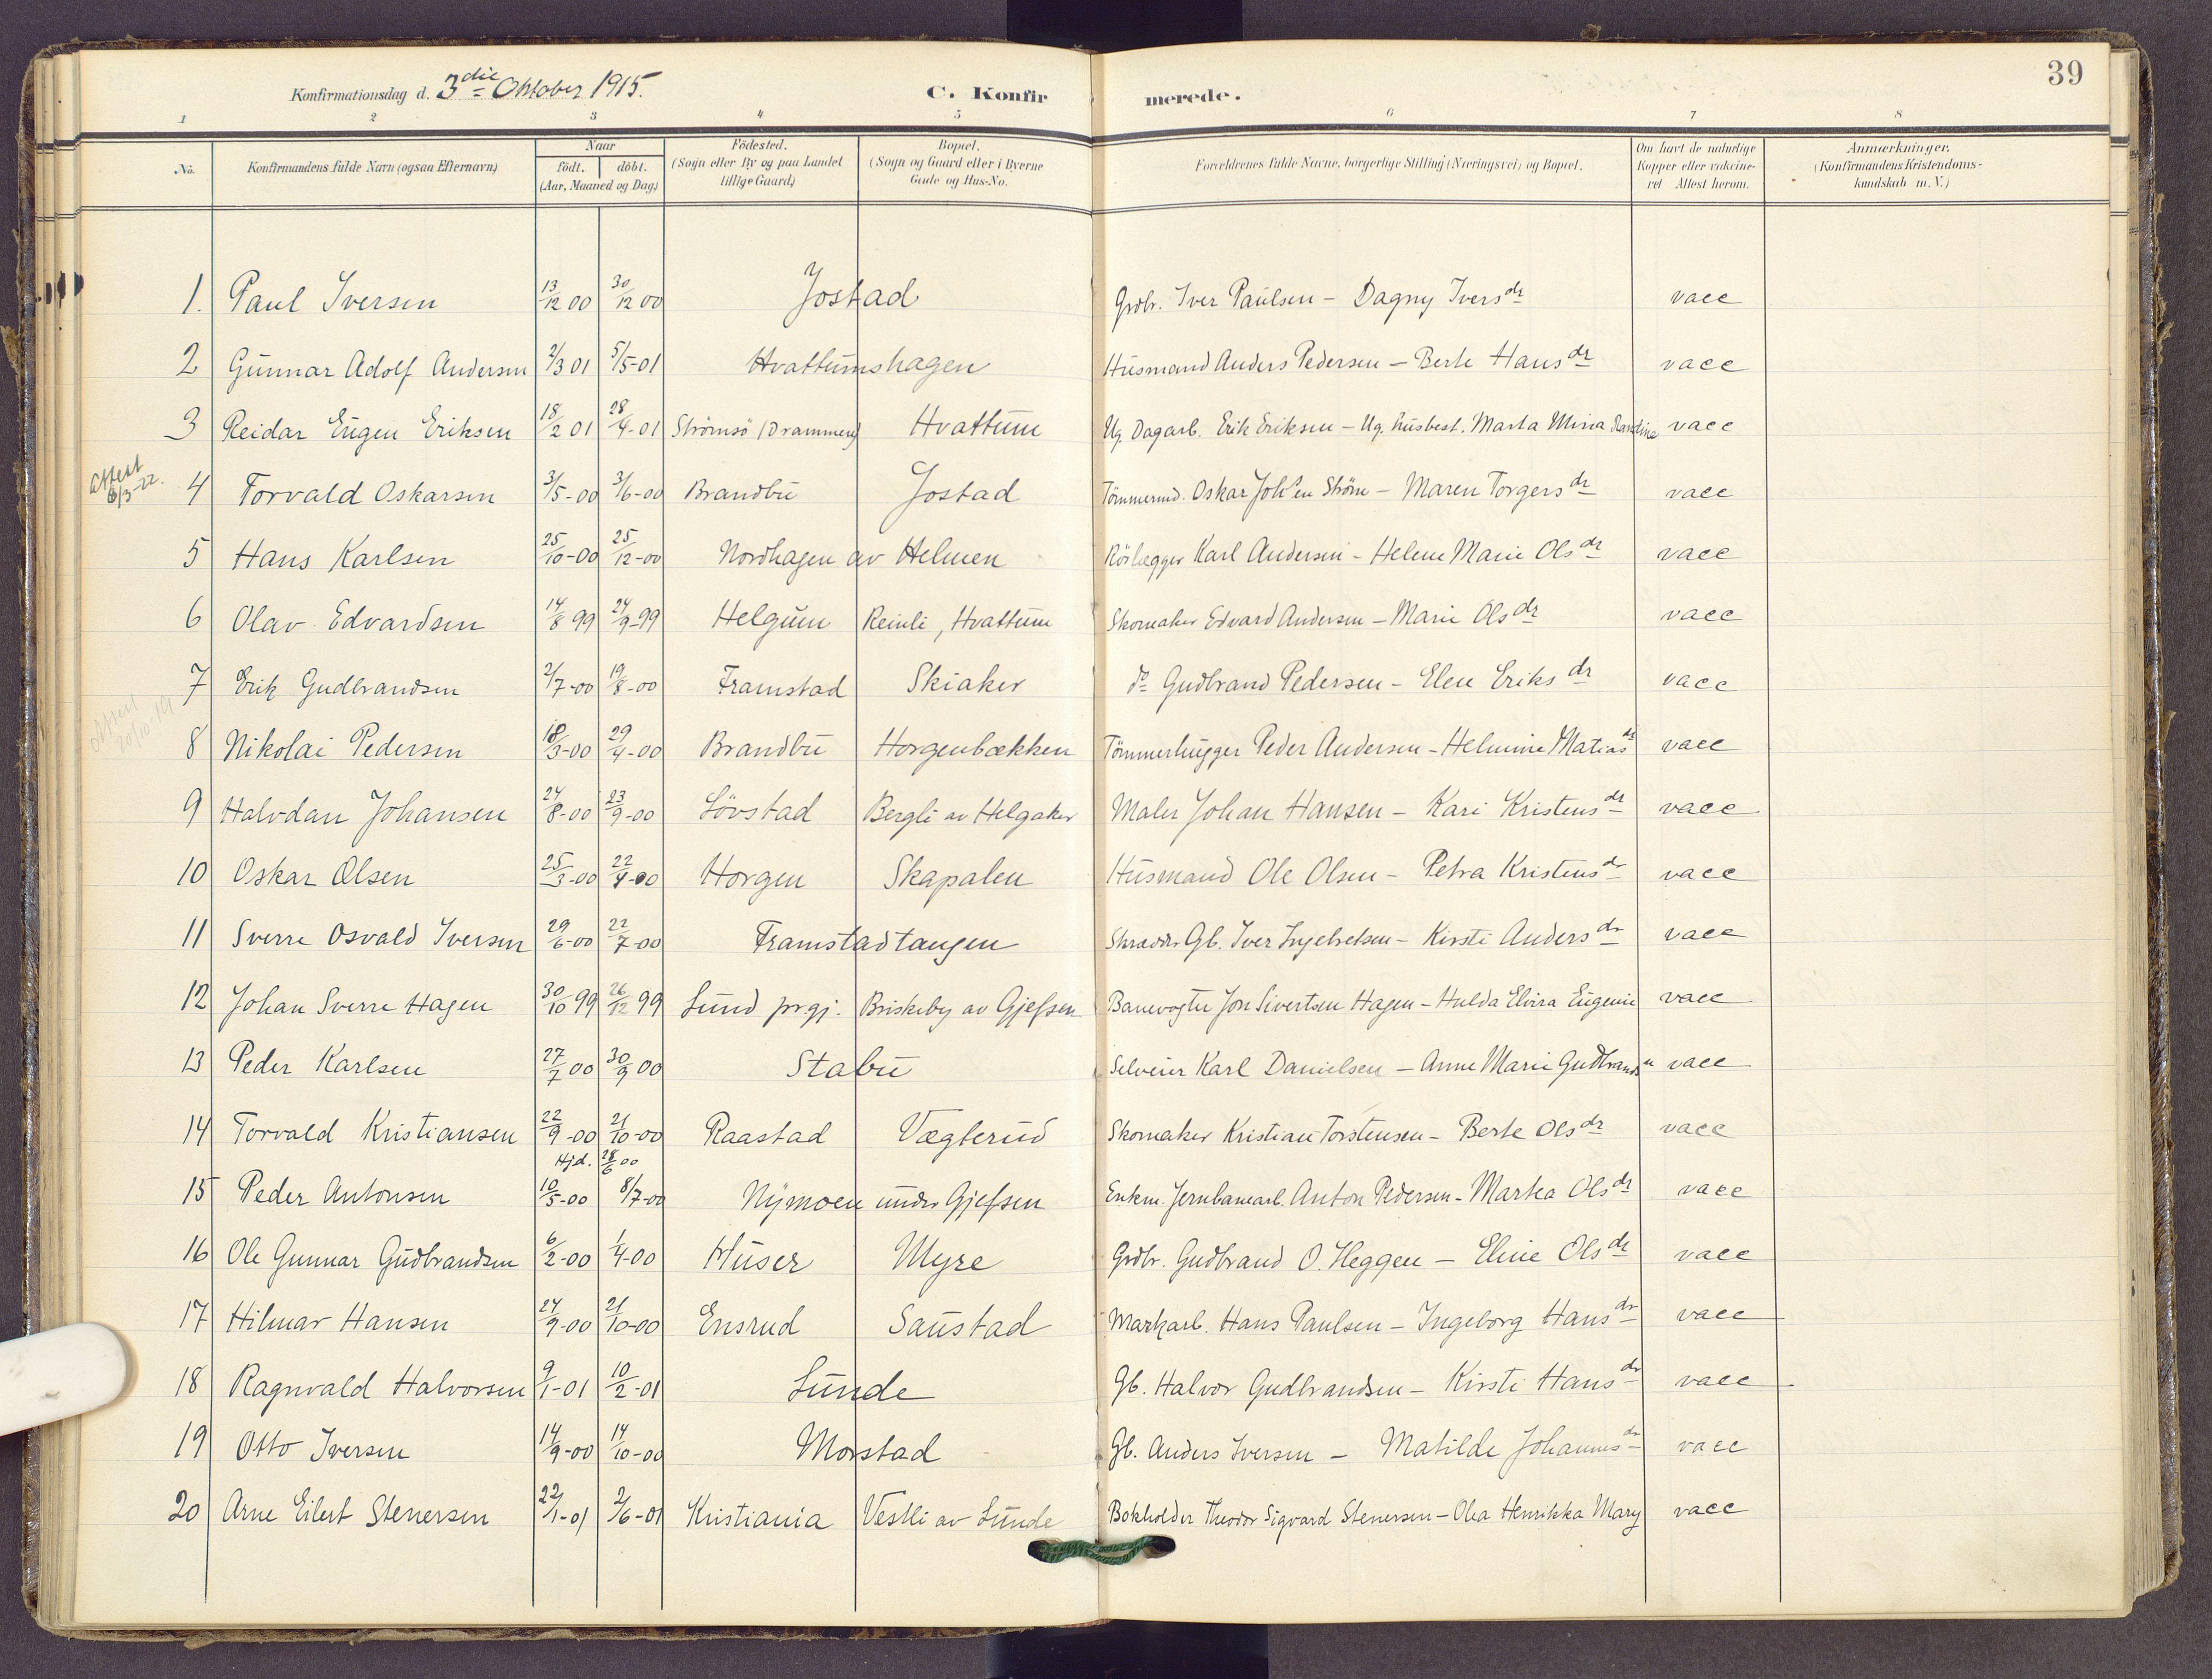 SAH, Gran prestekontor, Ministerialbok nr. 22, 1908-1918, s. 39